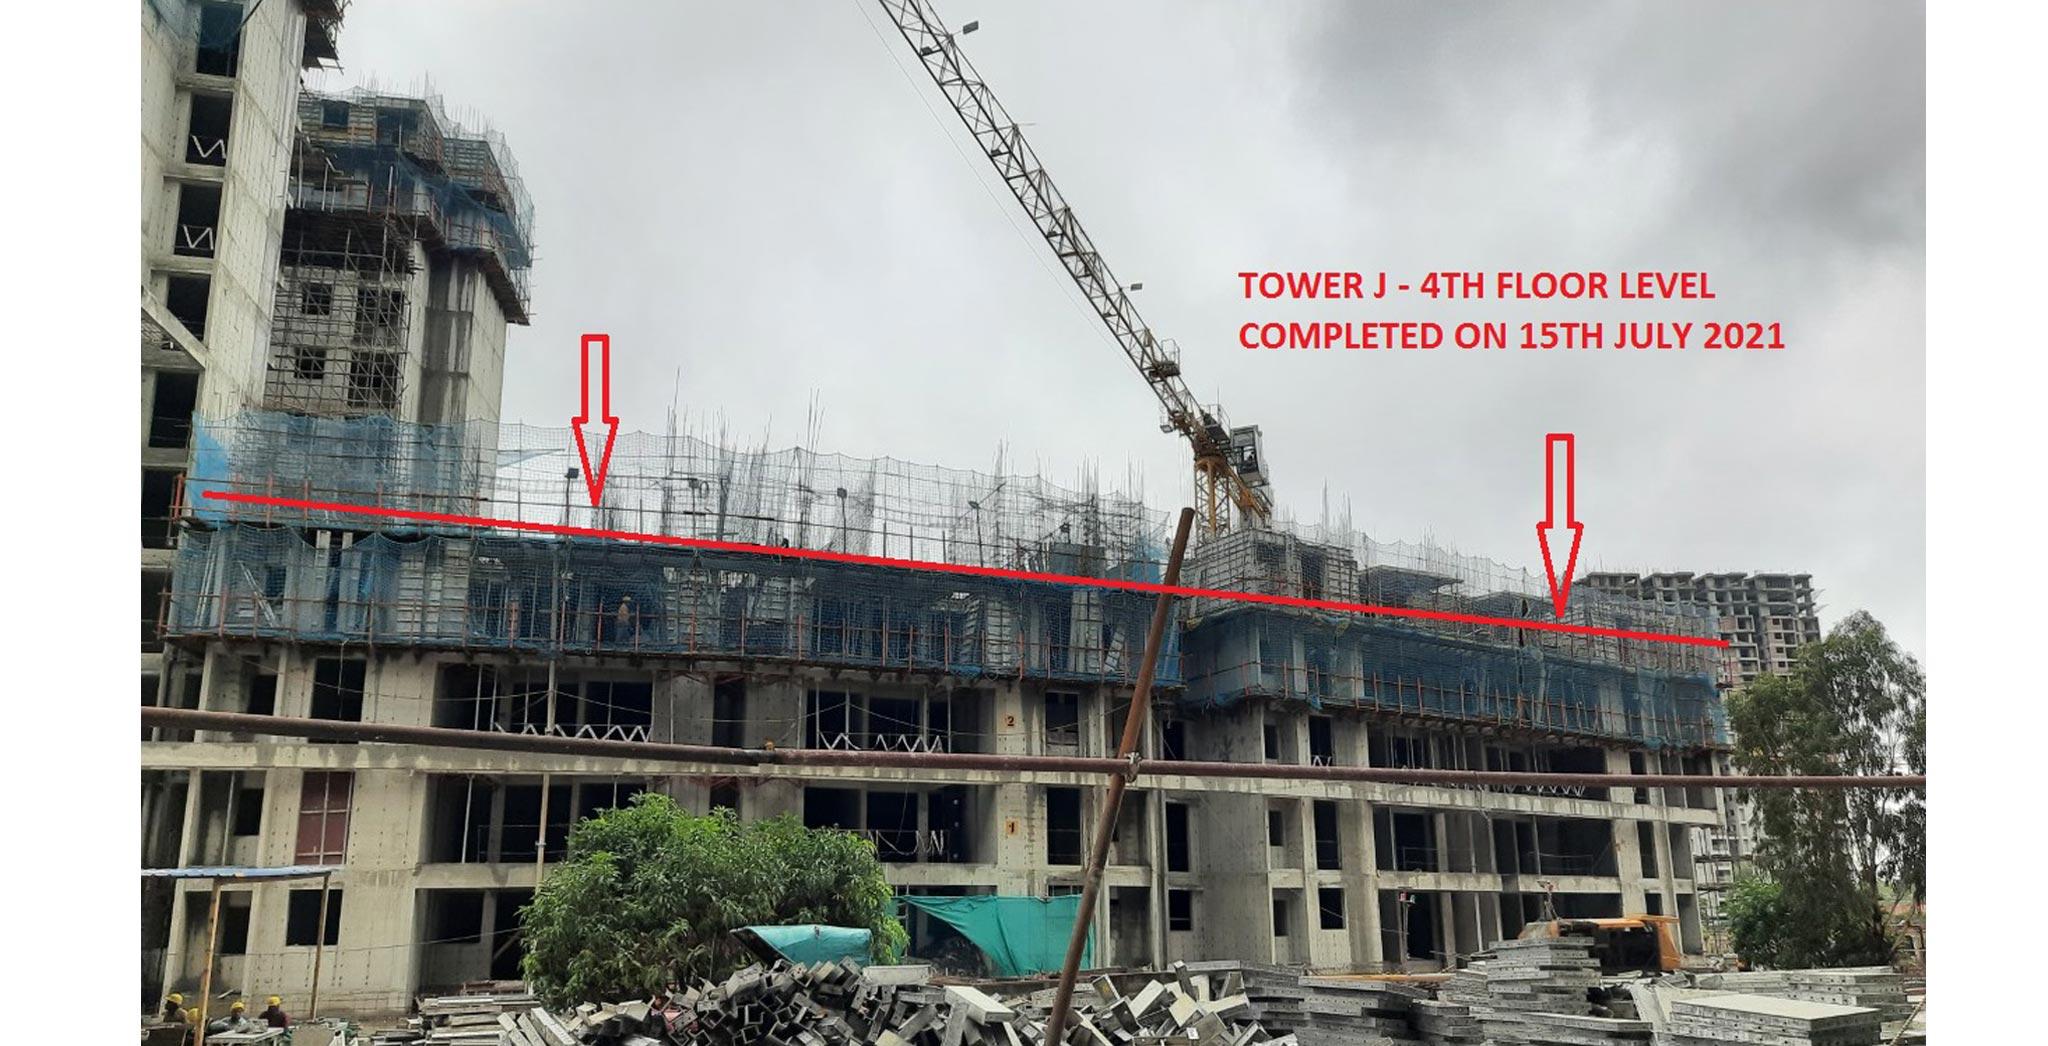 Jul 2021 - Halcyon: On Casting of 4th floor Slab- Tower J